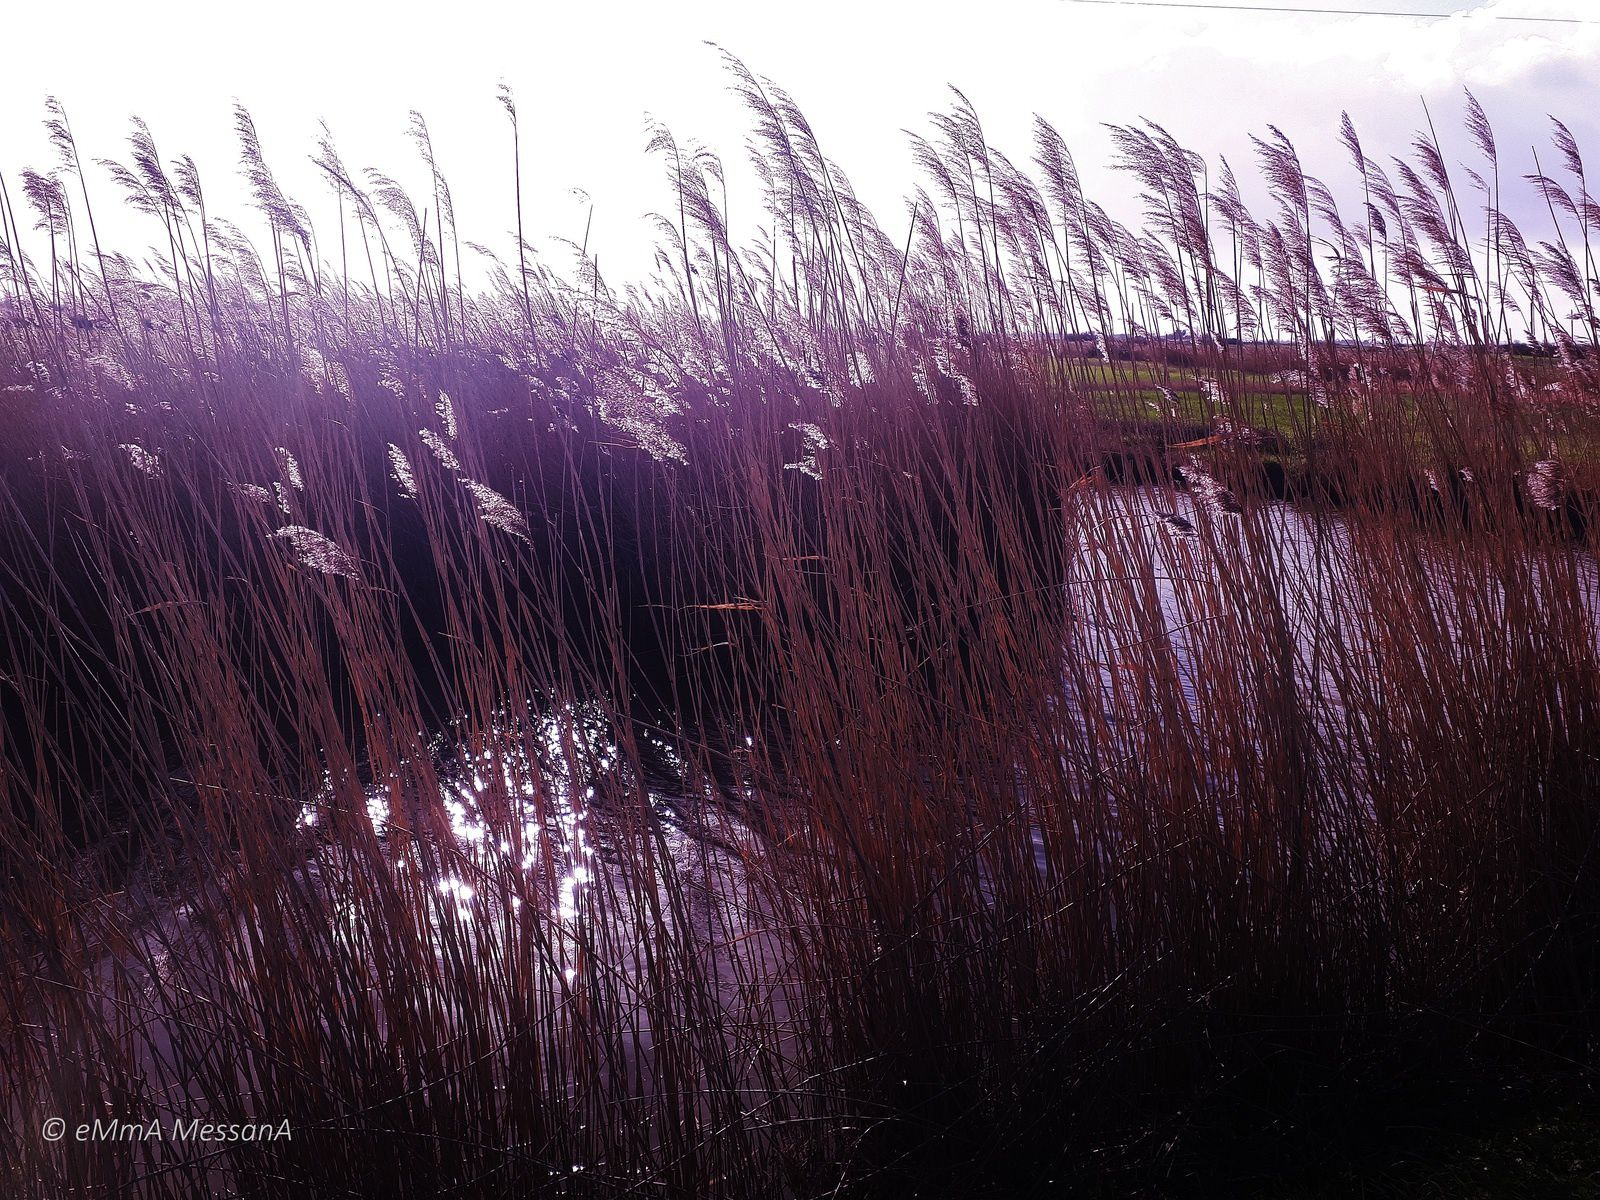 Saint-Urbain (Vendée), impression 3 du marais 27 janvier 2019 © eMmA MessanA